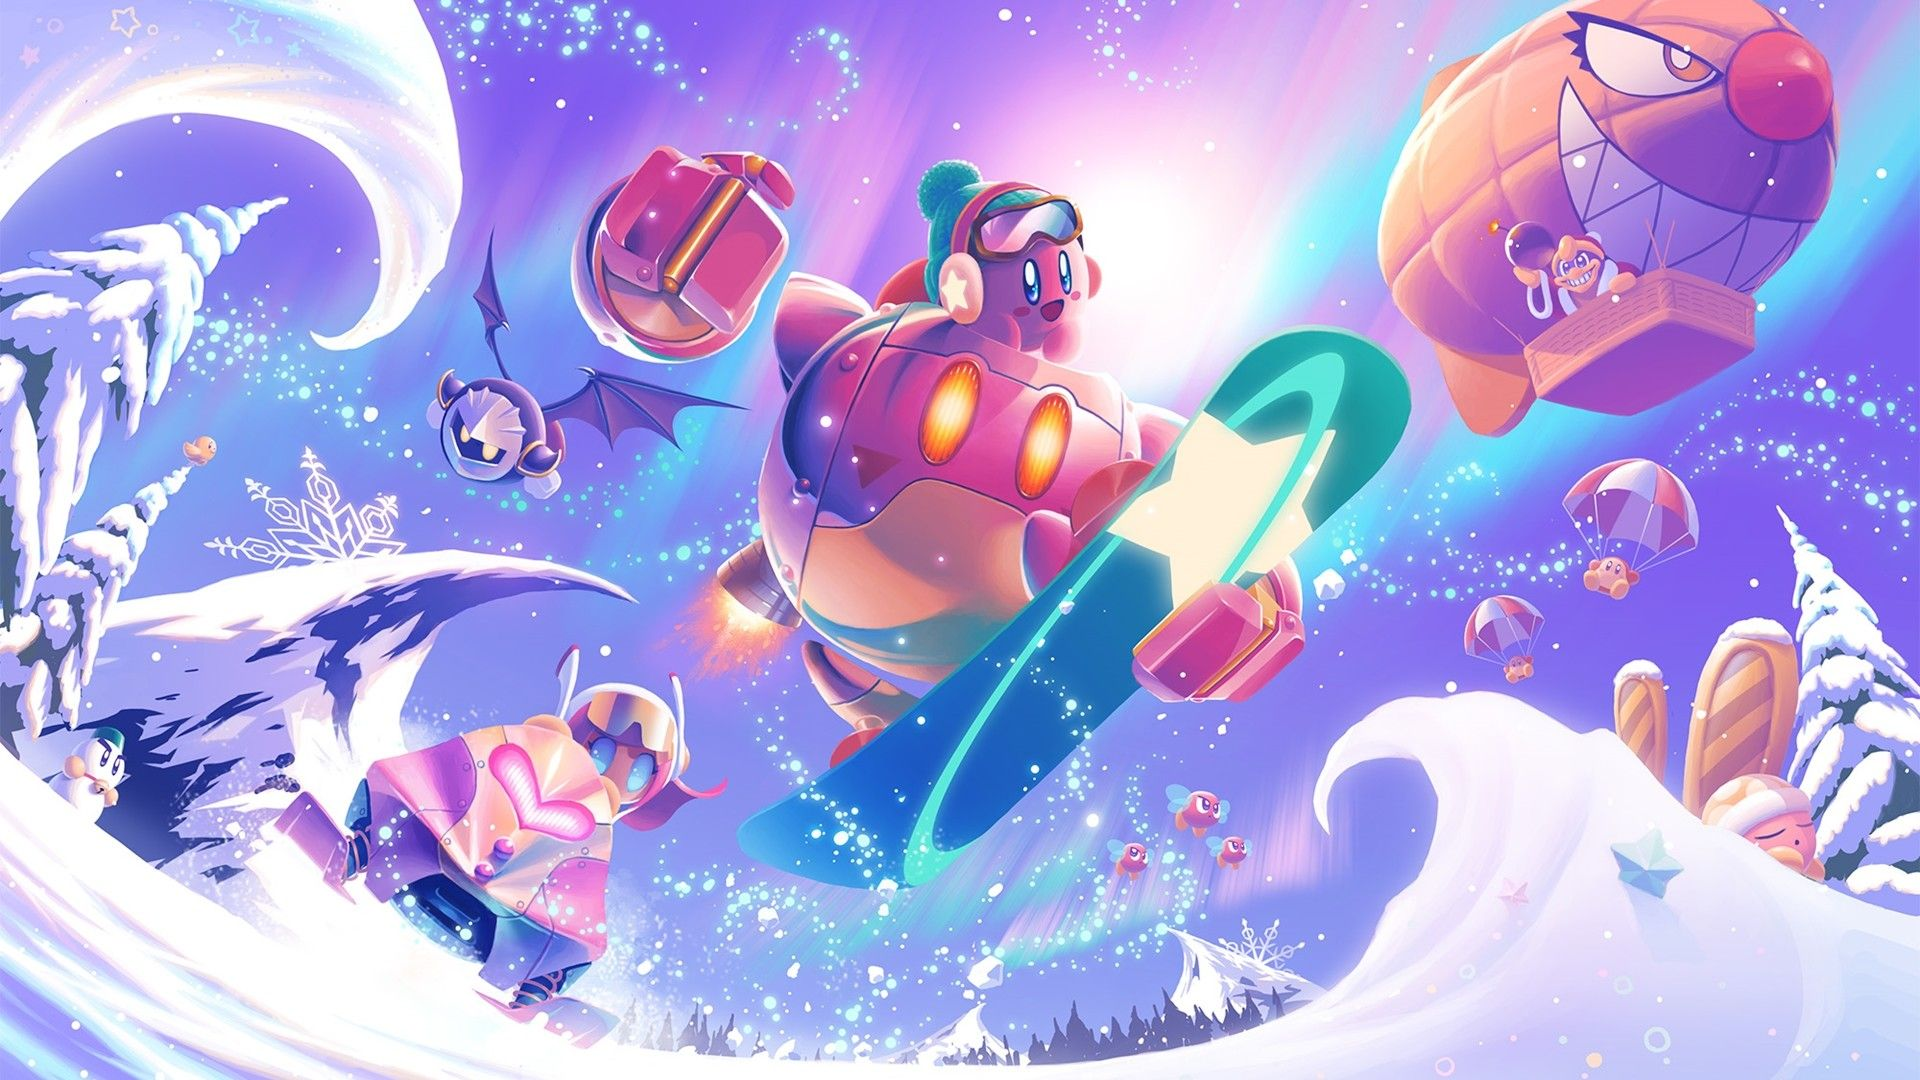 Kirby new wallpaper